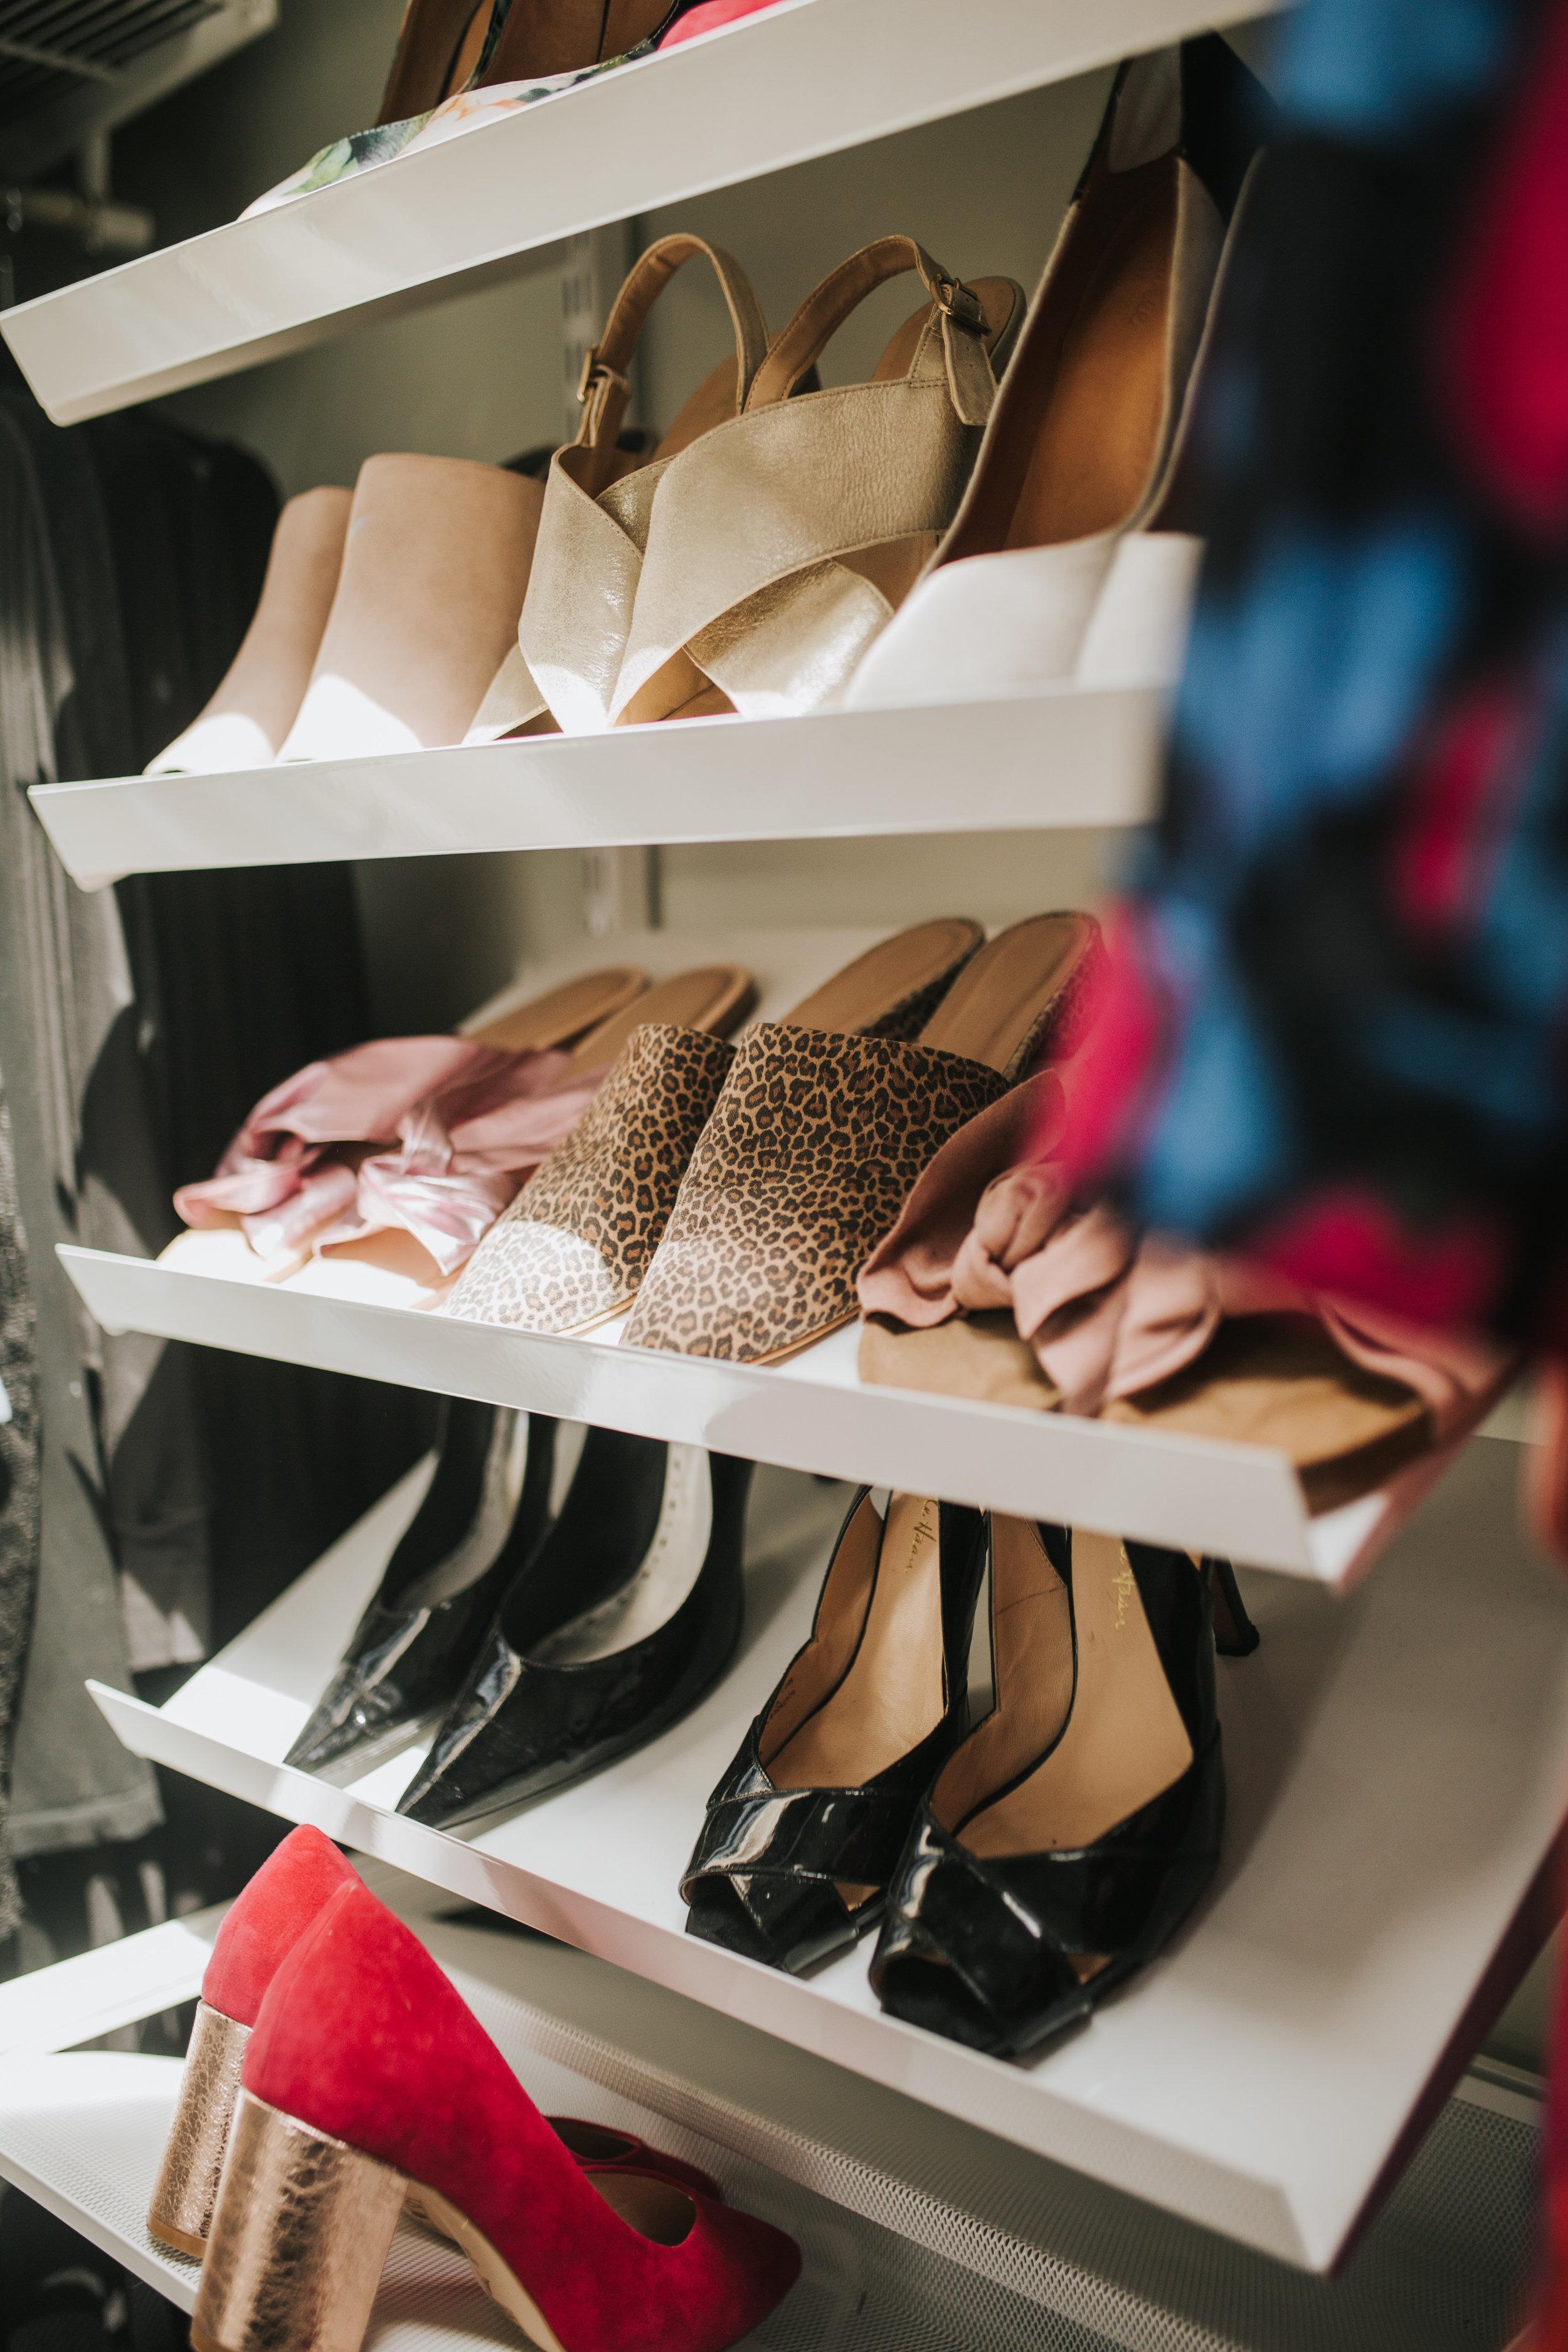 consign-couture-kiararose-store-61.jpg